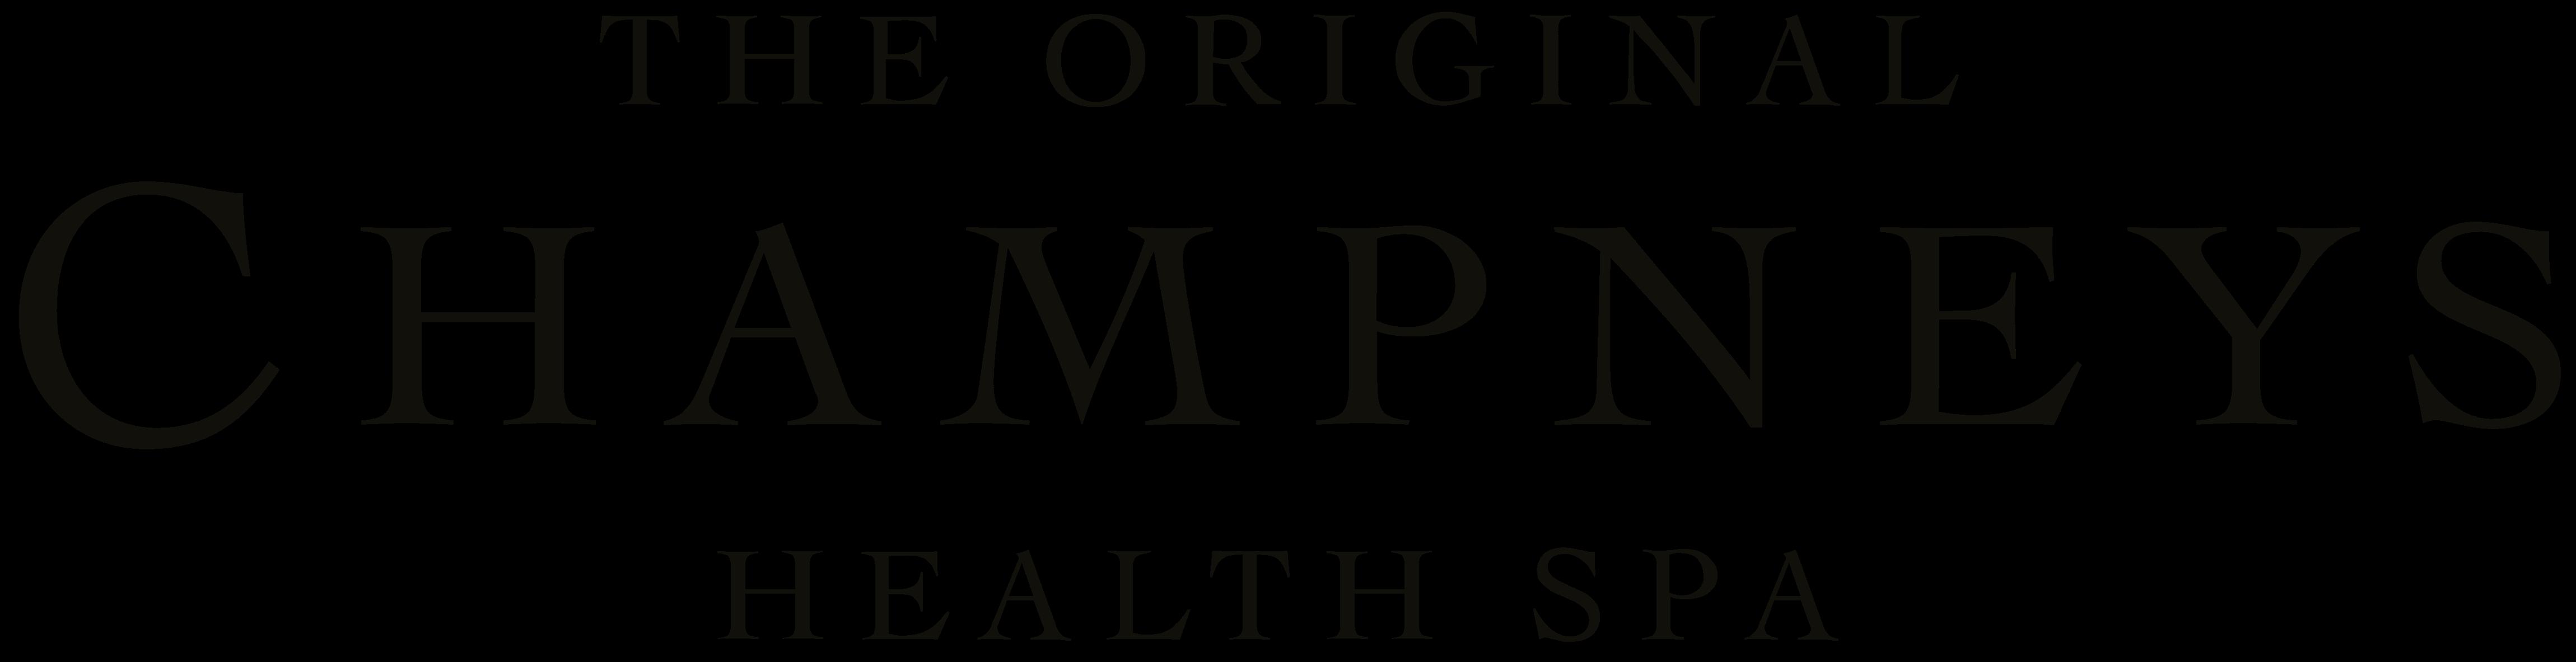 Champneys Logo The Original Health Spa